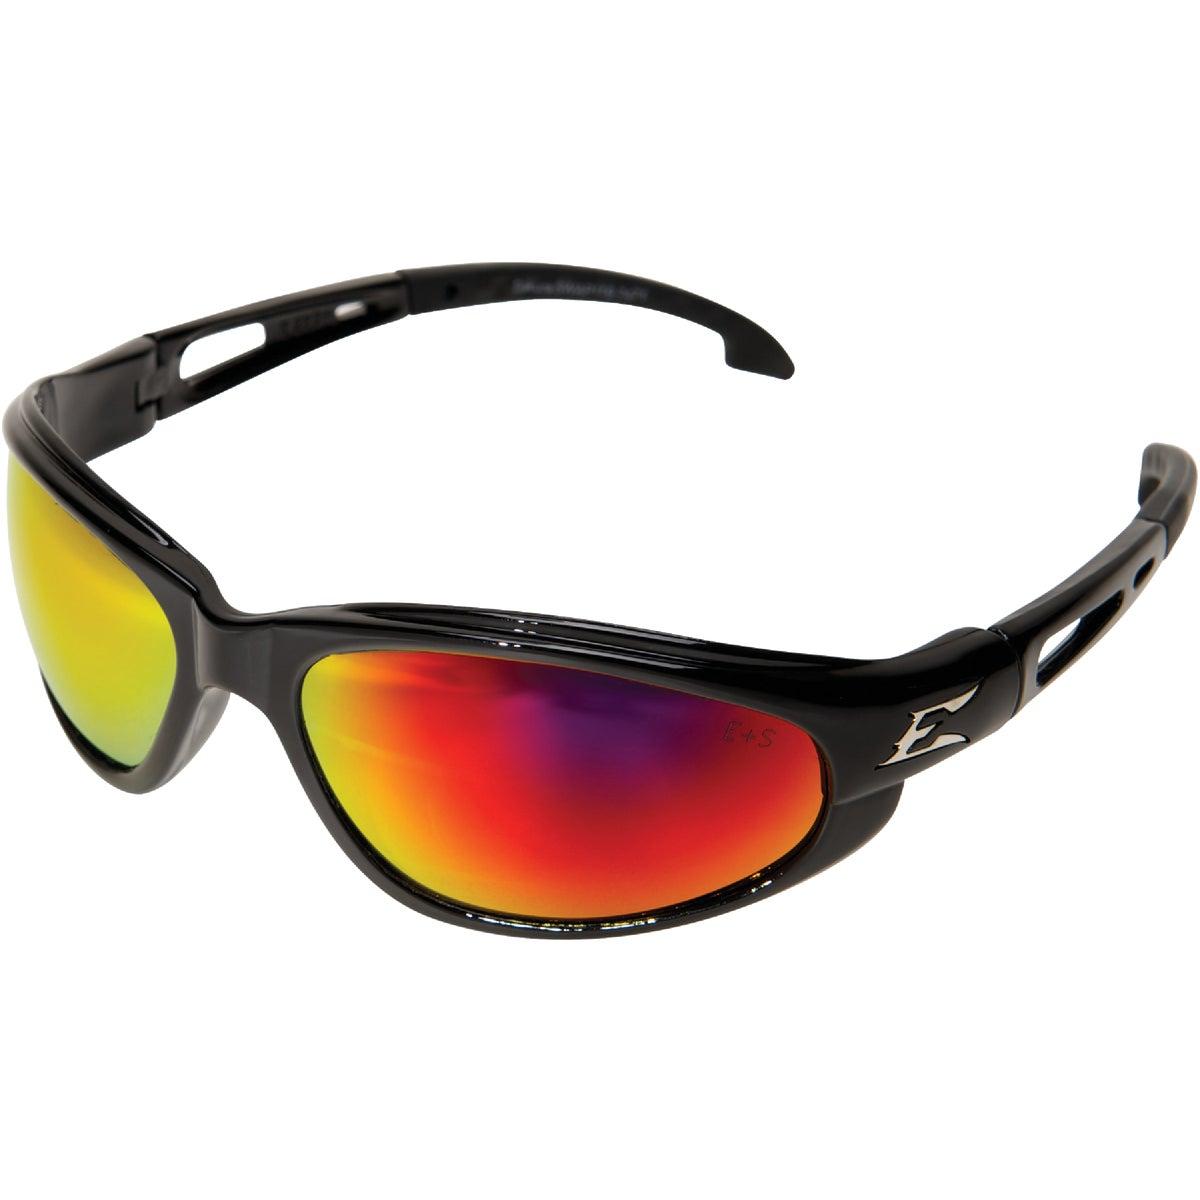 DAKURA BLK/APRD MIR LENS - SWAP119 by Edge Eyewear